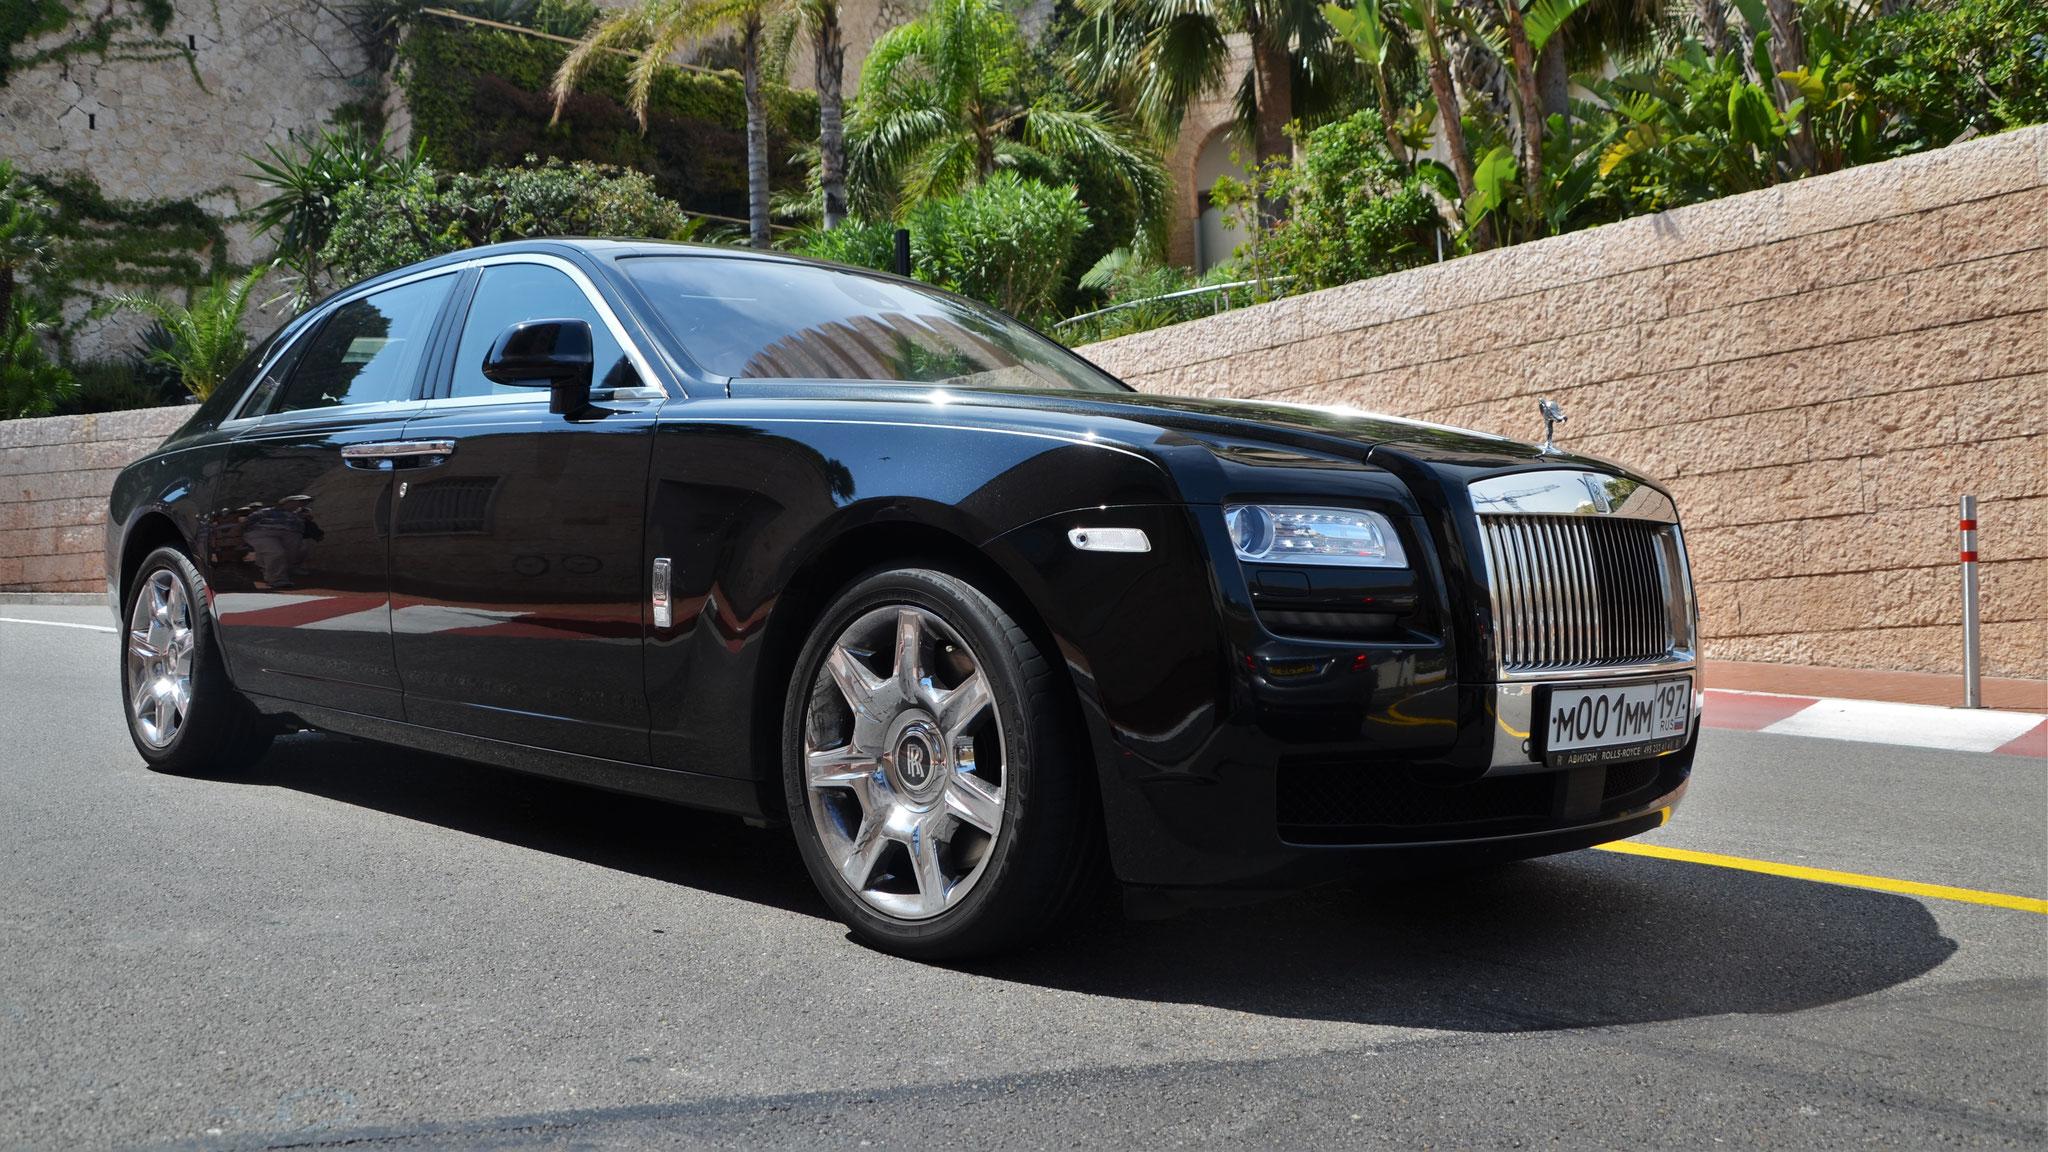 Rolls Royce Ghost - M-001M-197 (RUS)